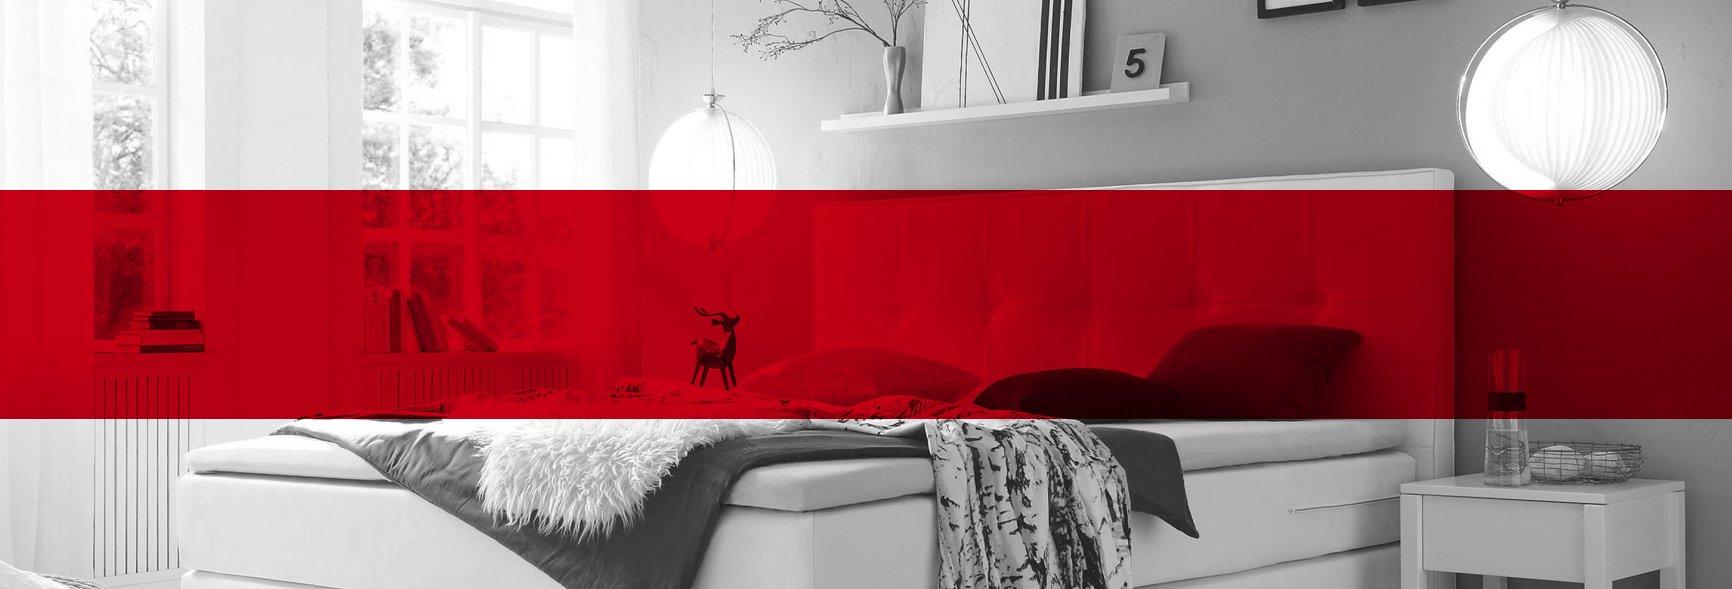 Full Size of Bett Kaufen Hamburg Boxspringbetten Wasserbetten Fachgeschft Schlaferei Trends Betten 120x200 Halbhohes Weiß 140x200 160x200 Einfaches Home Affaire Lattenrost Bett Bett Kaufen Hamburg